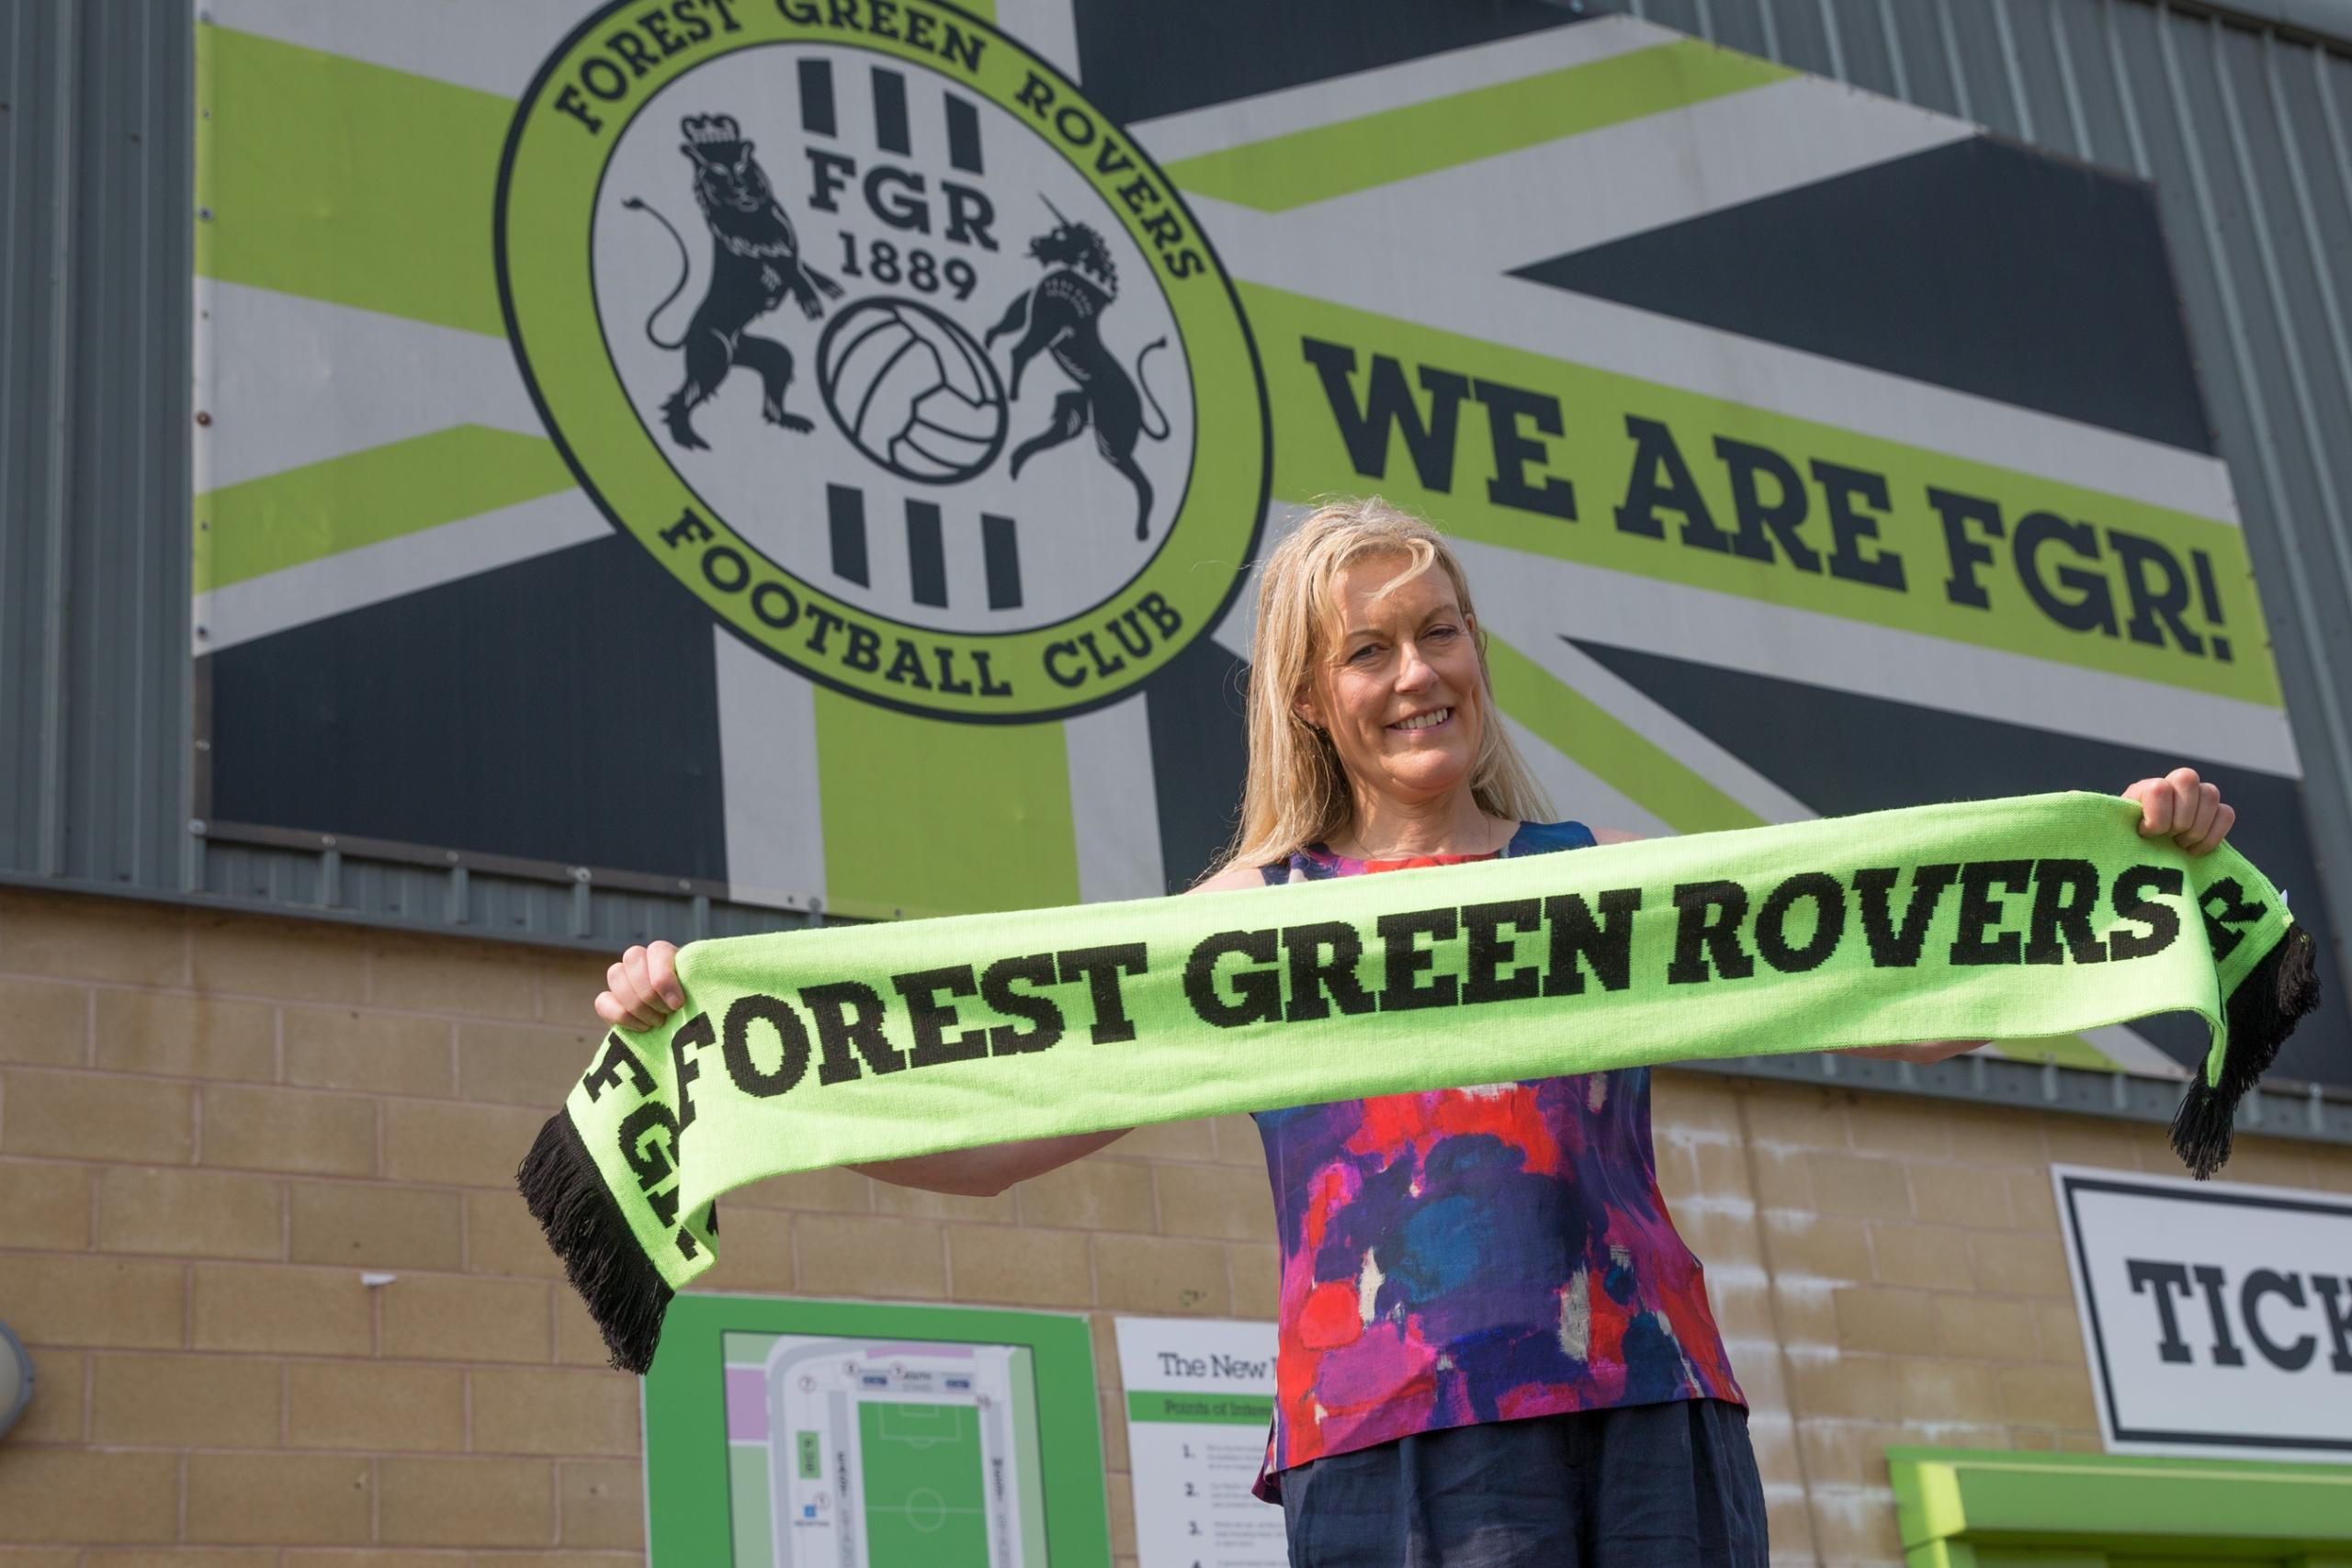 Helen holding FGR scarf outside the stadium, big FGR flag in teh background